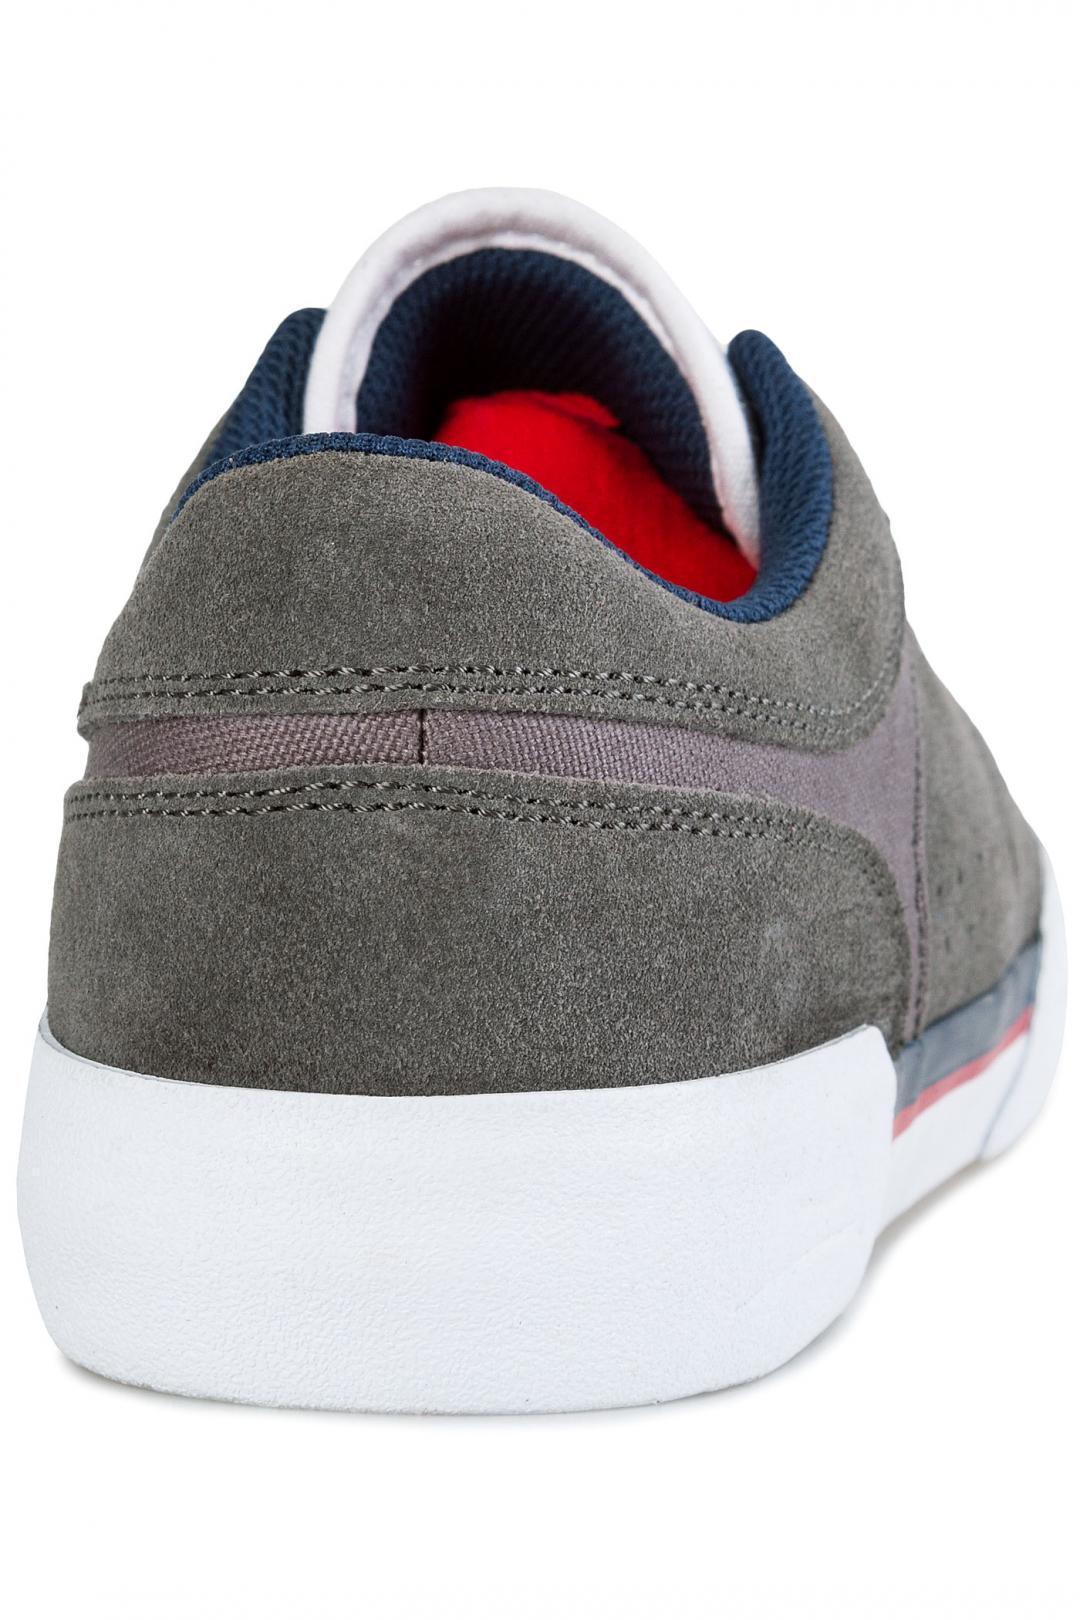 Uomo Lakai Staple Suede grey | Sneakers low top